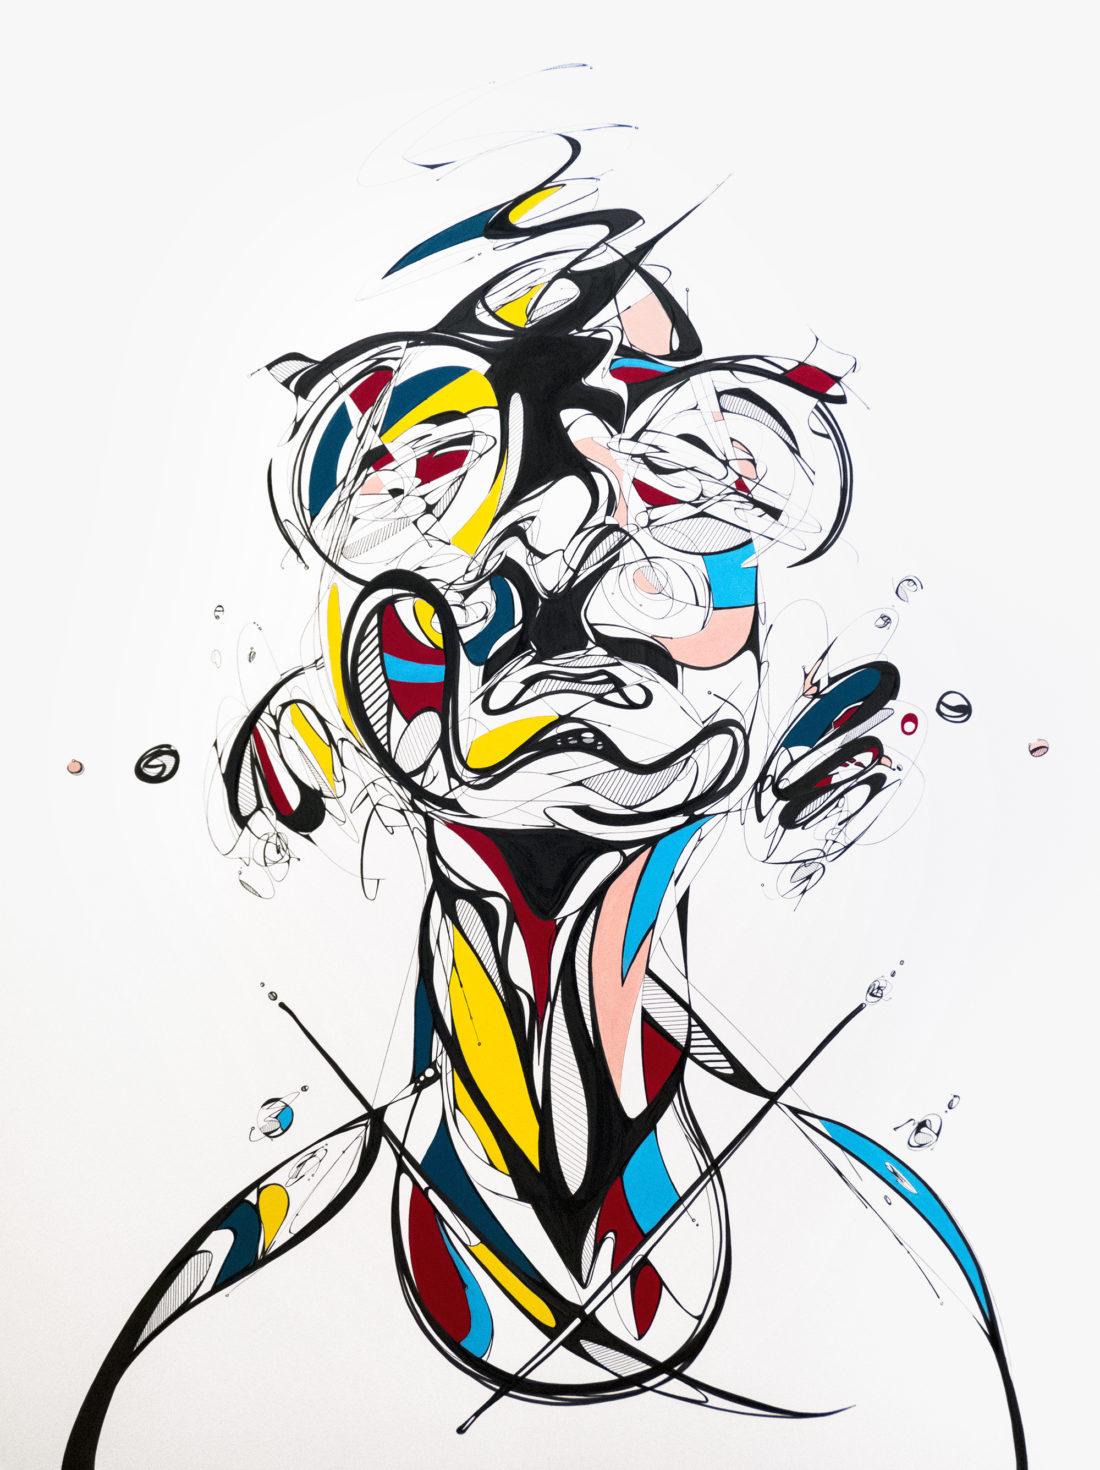 Untitled #3 (Stateless) - Martin Kalanda